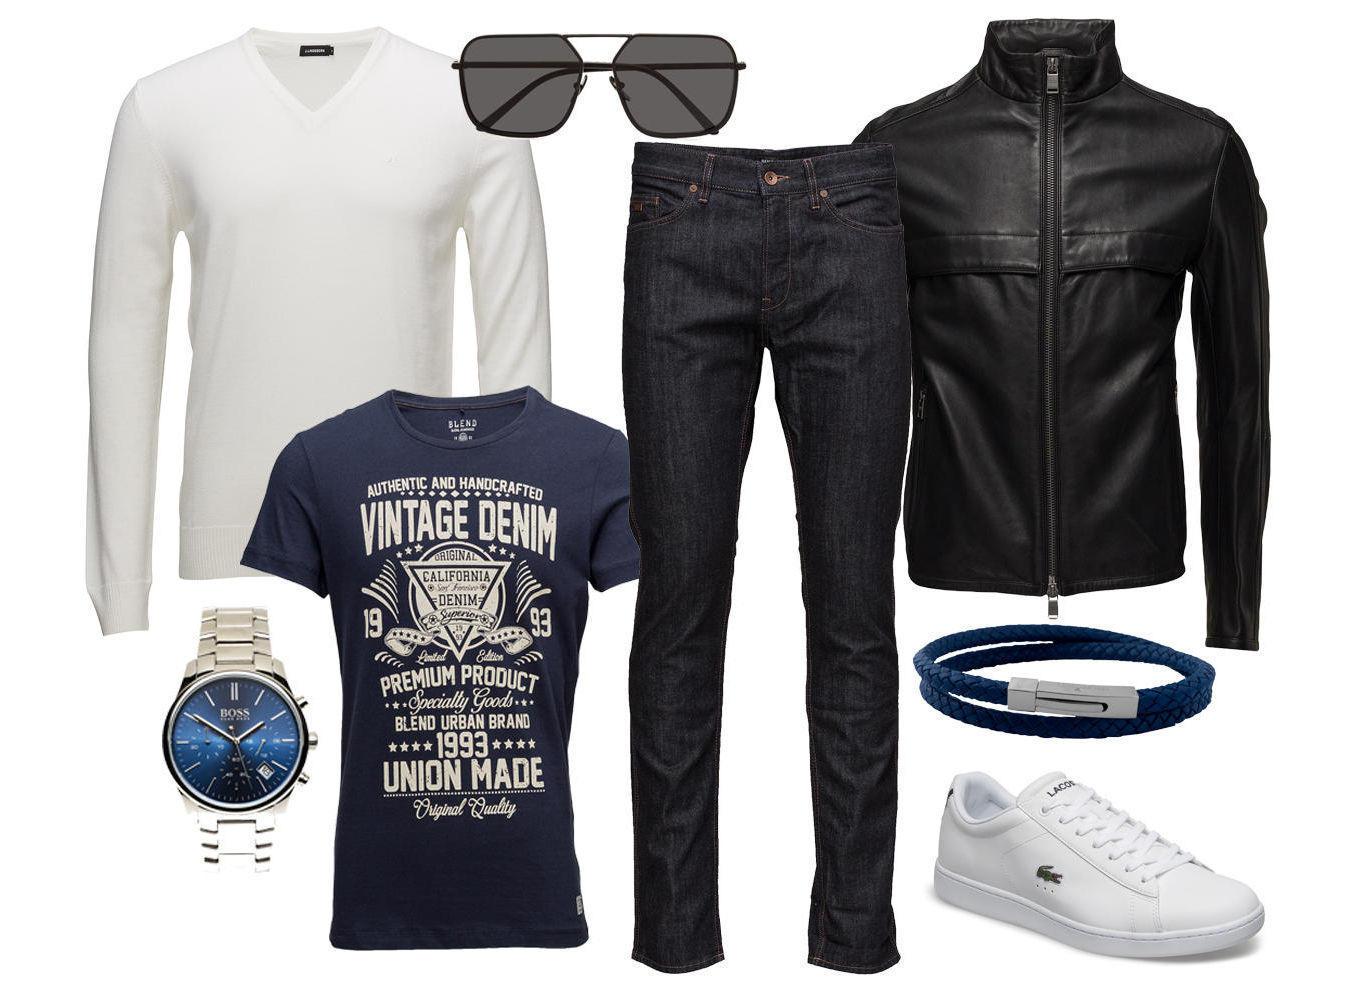 2329a542 Fra venstre: Genser – Klokke – T-skjorte – Solbriller – Jeans – Skinnjakke  – Armbånd – Sneakers